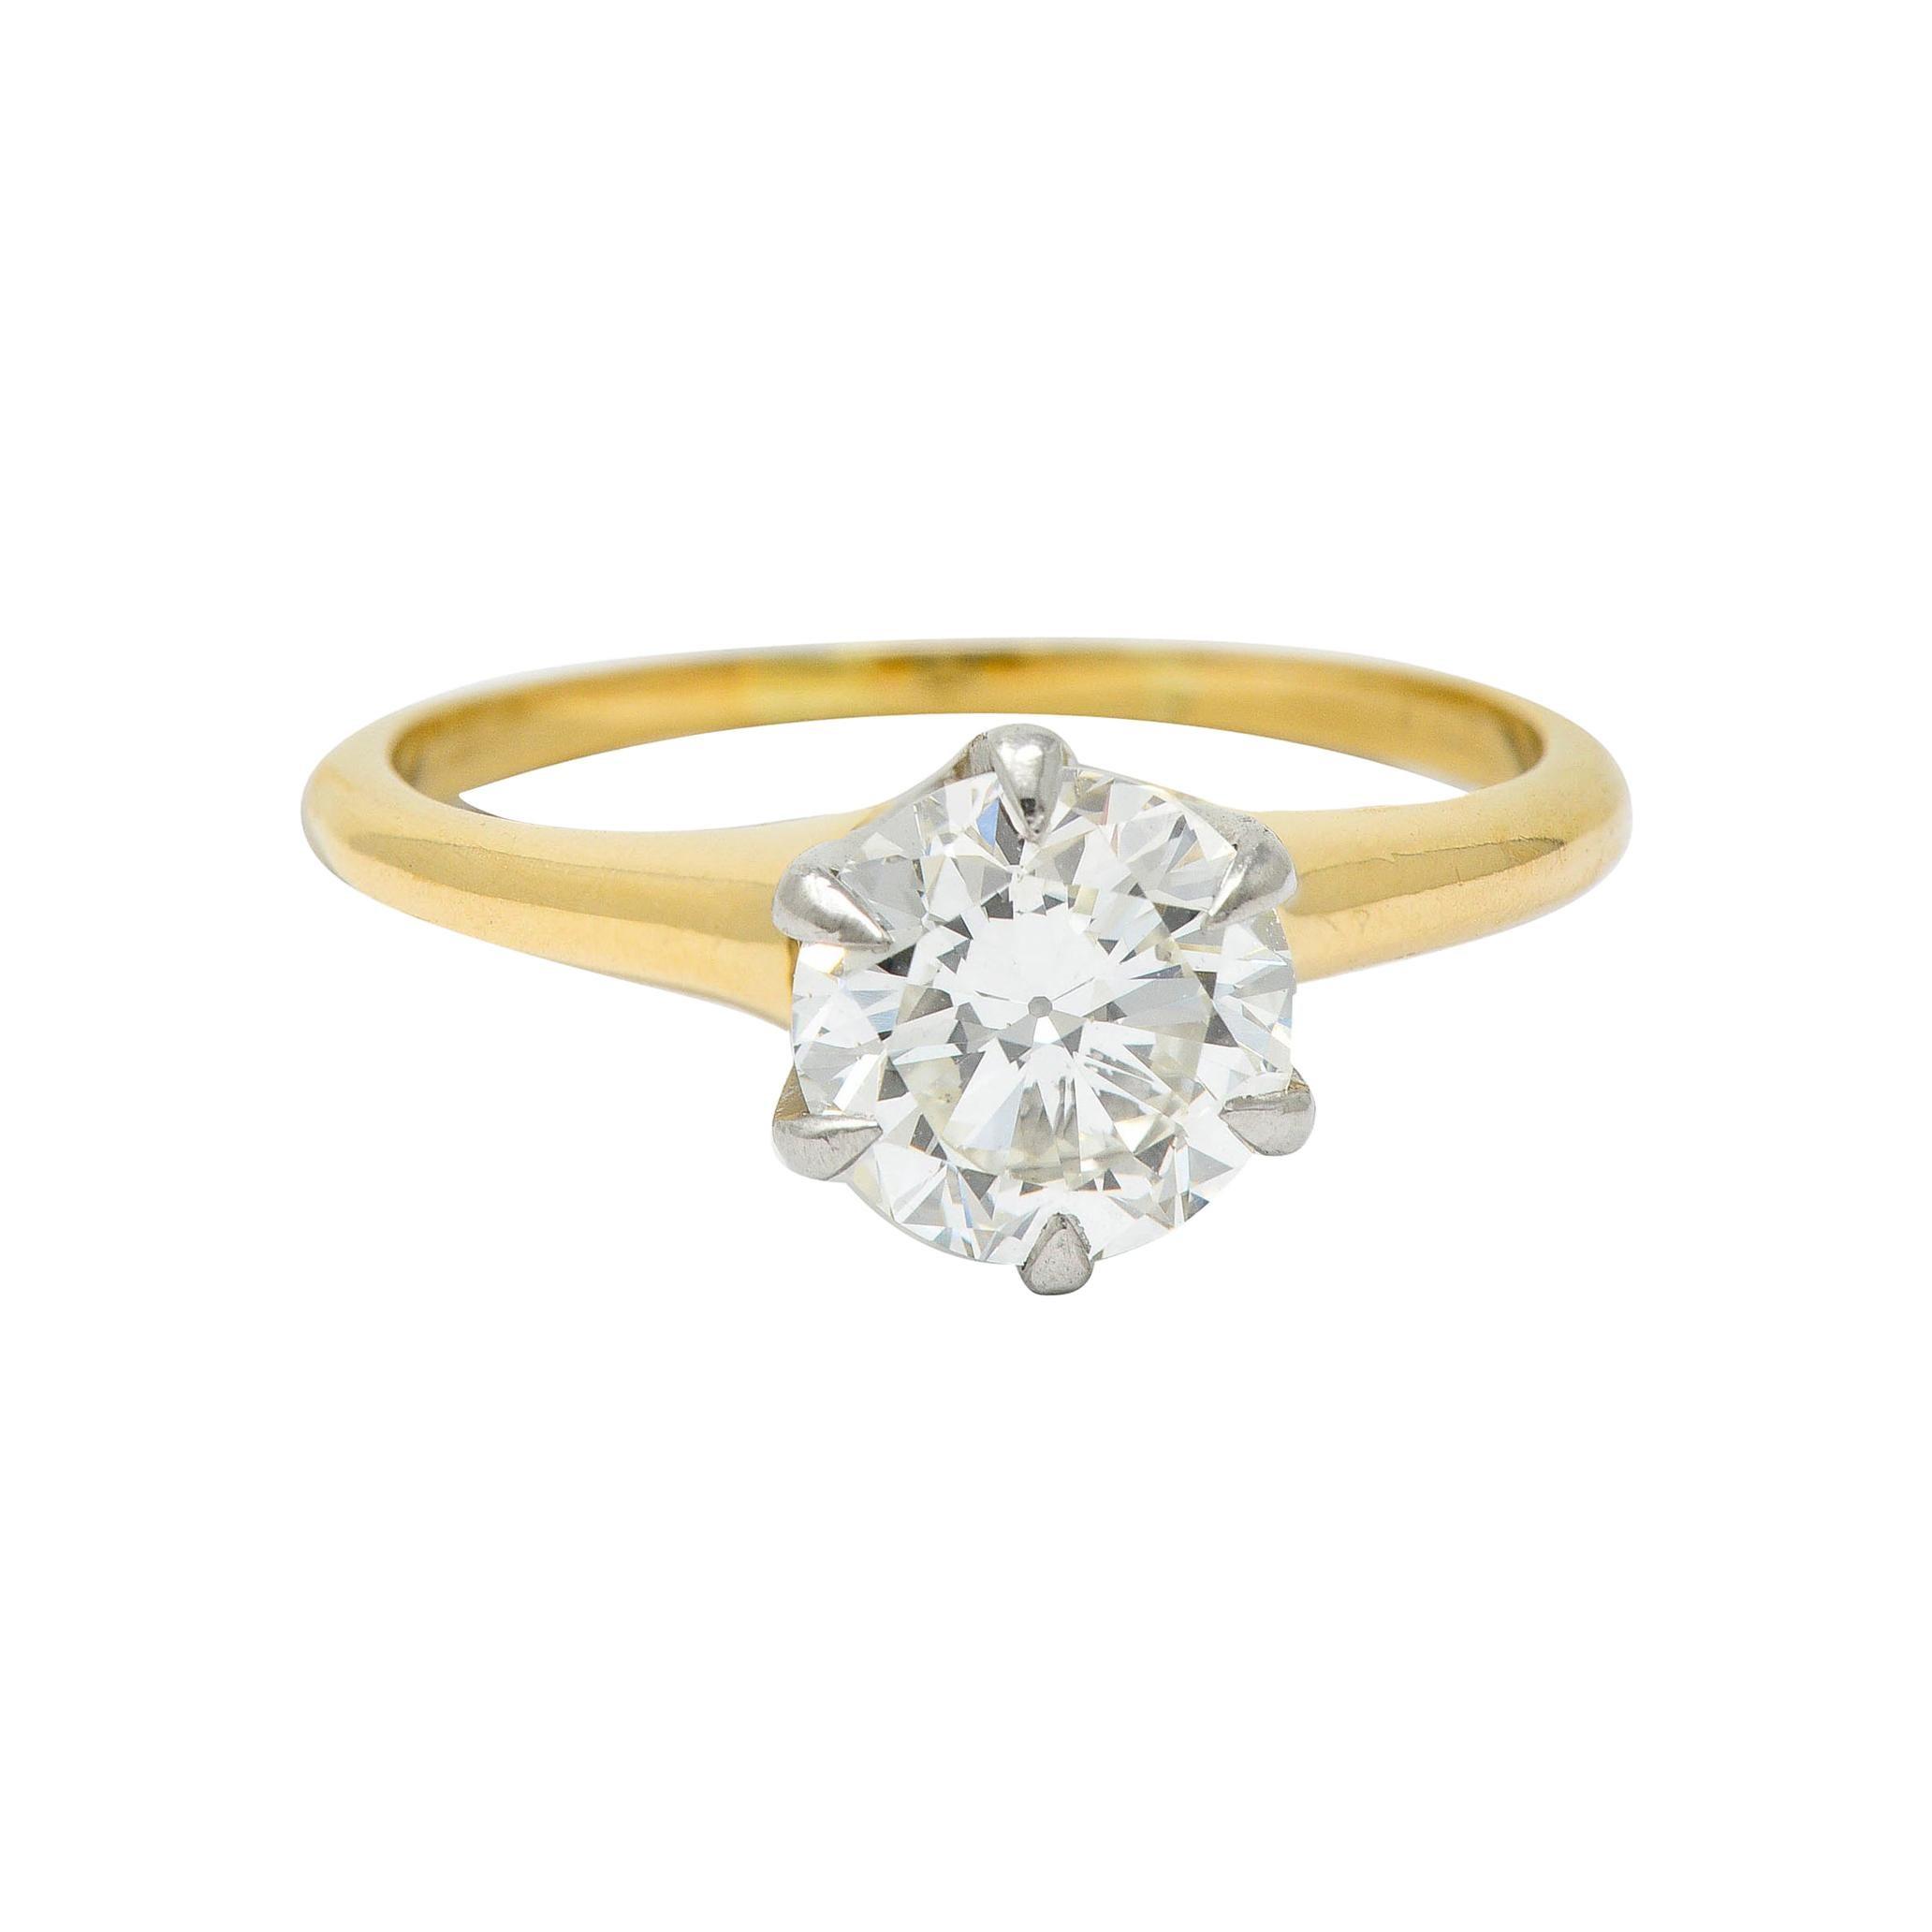 J.E. Caldwell 1.19 Carats Diamond 14 Karat Gold Solitaire Engagement Ring GIA